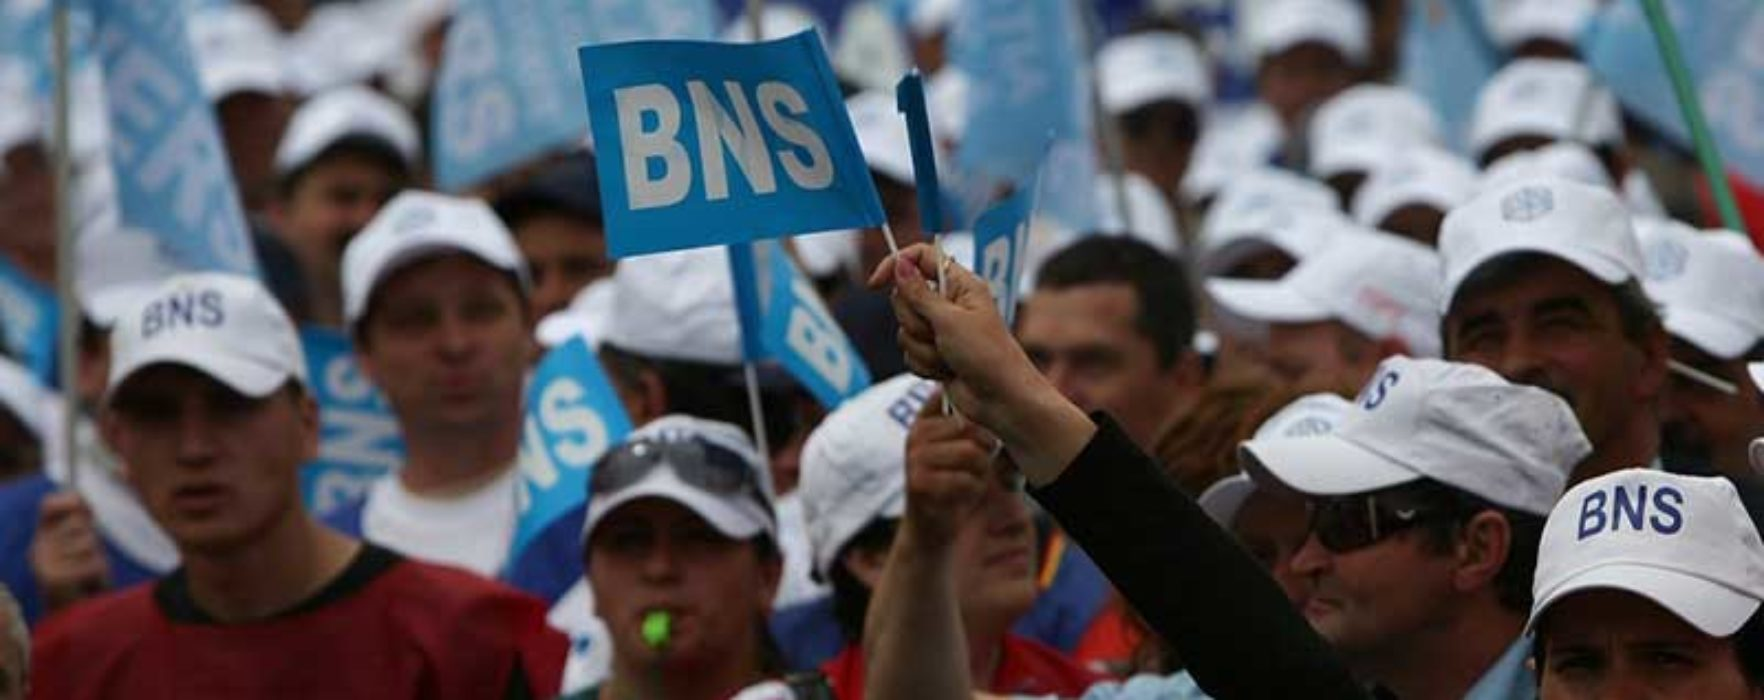 Dâmboviţa: Circa 50 de sindicalişti BNS au pichetat sediul prefecturii